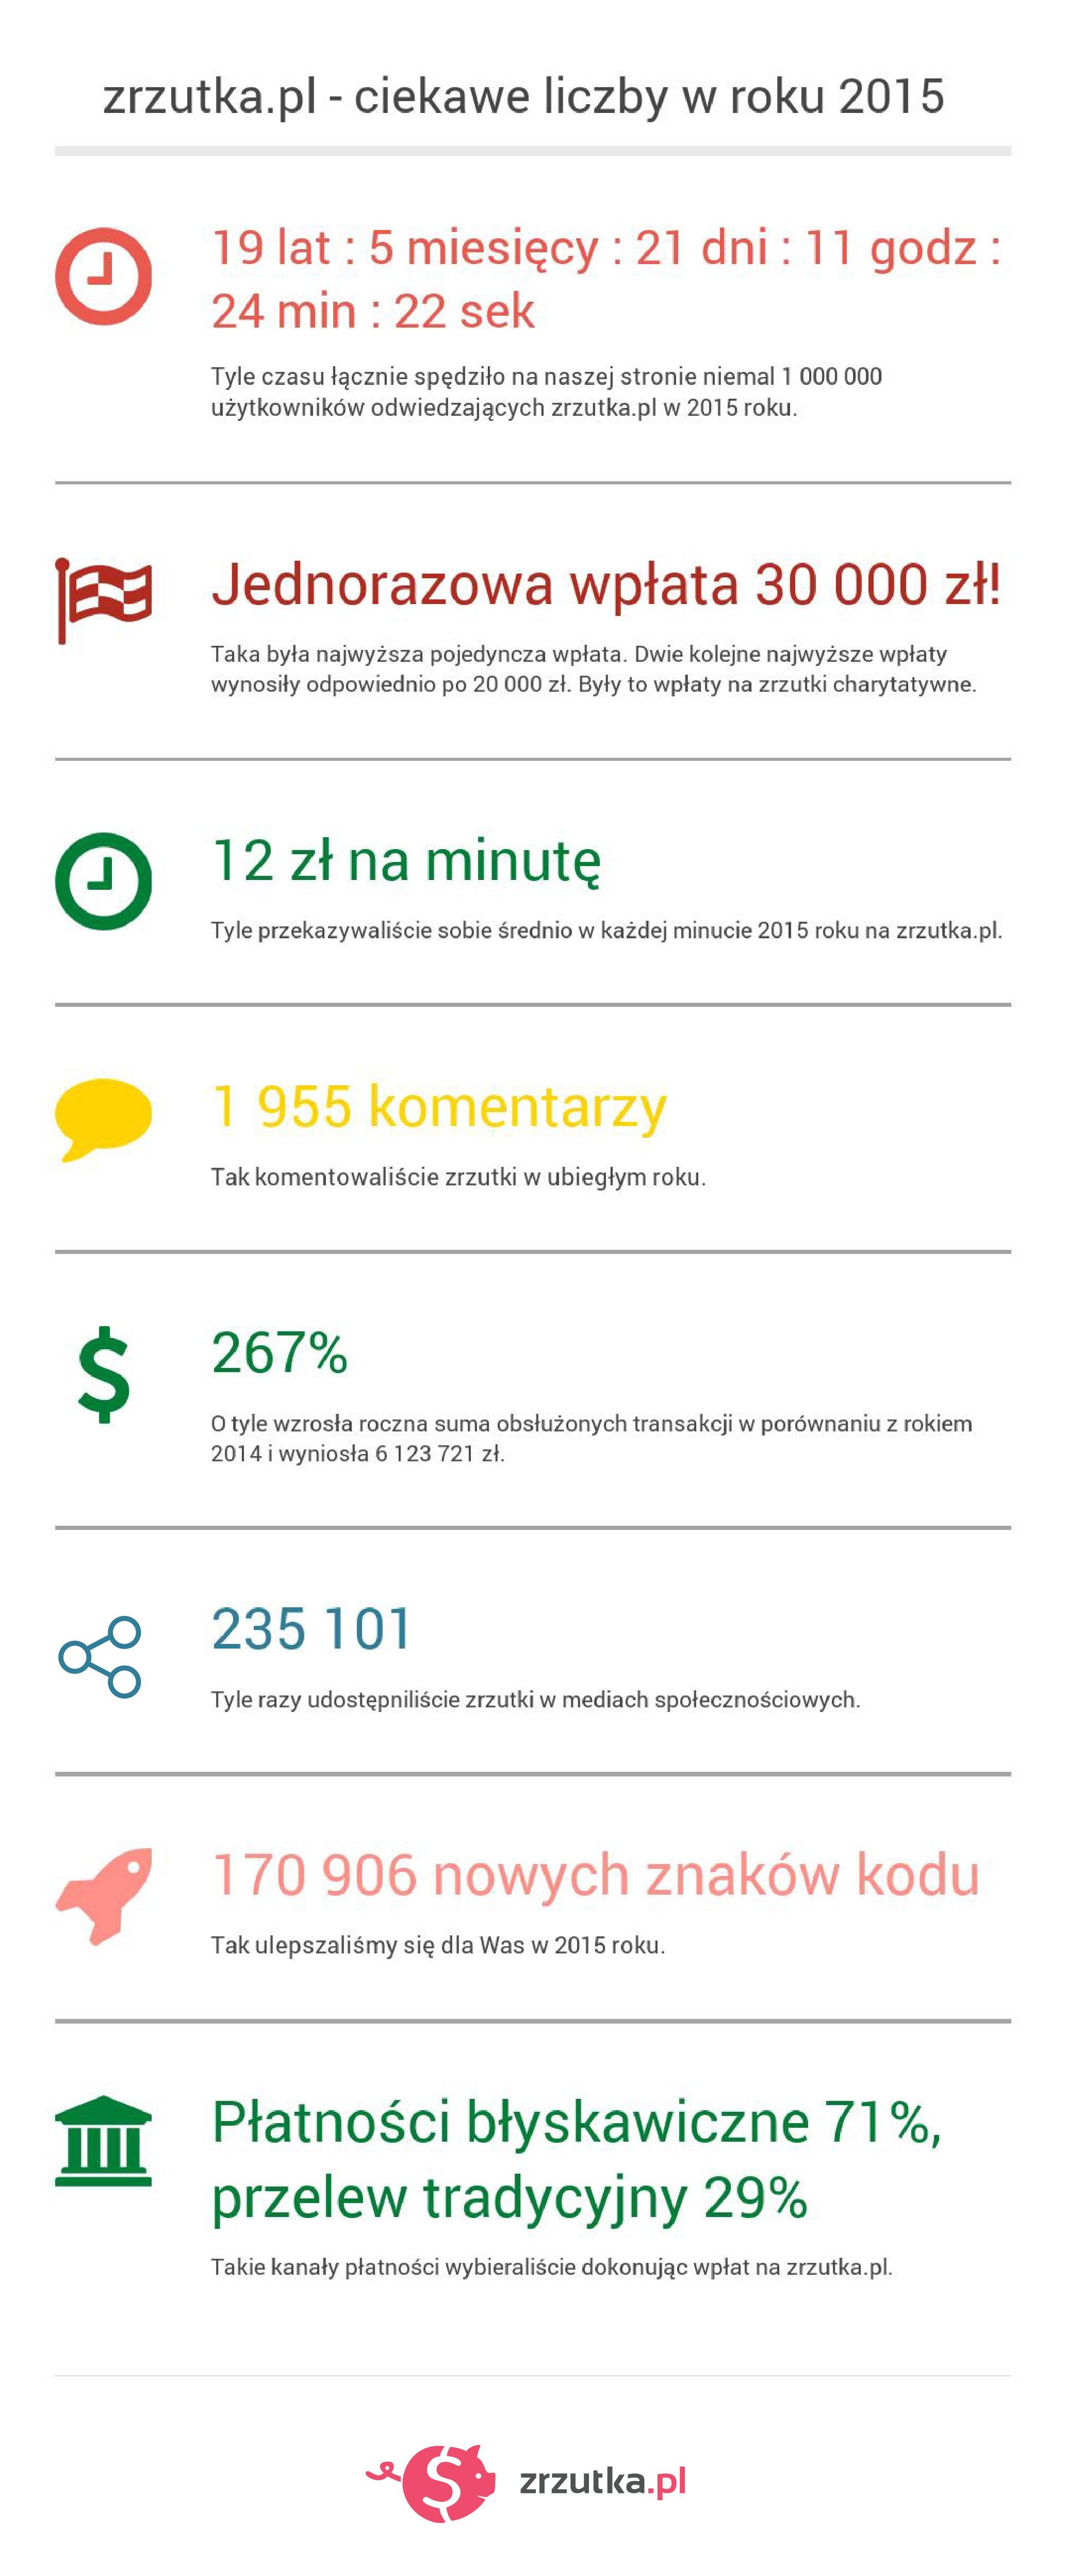 zrzutka_infografika